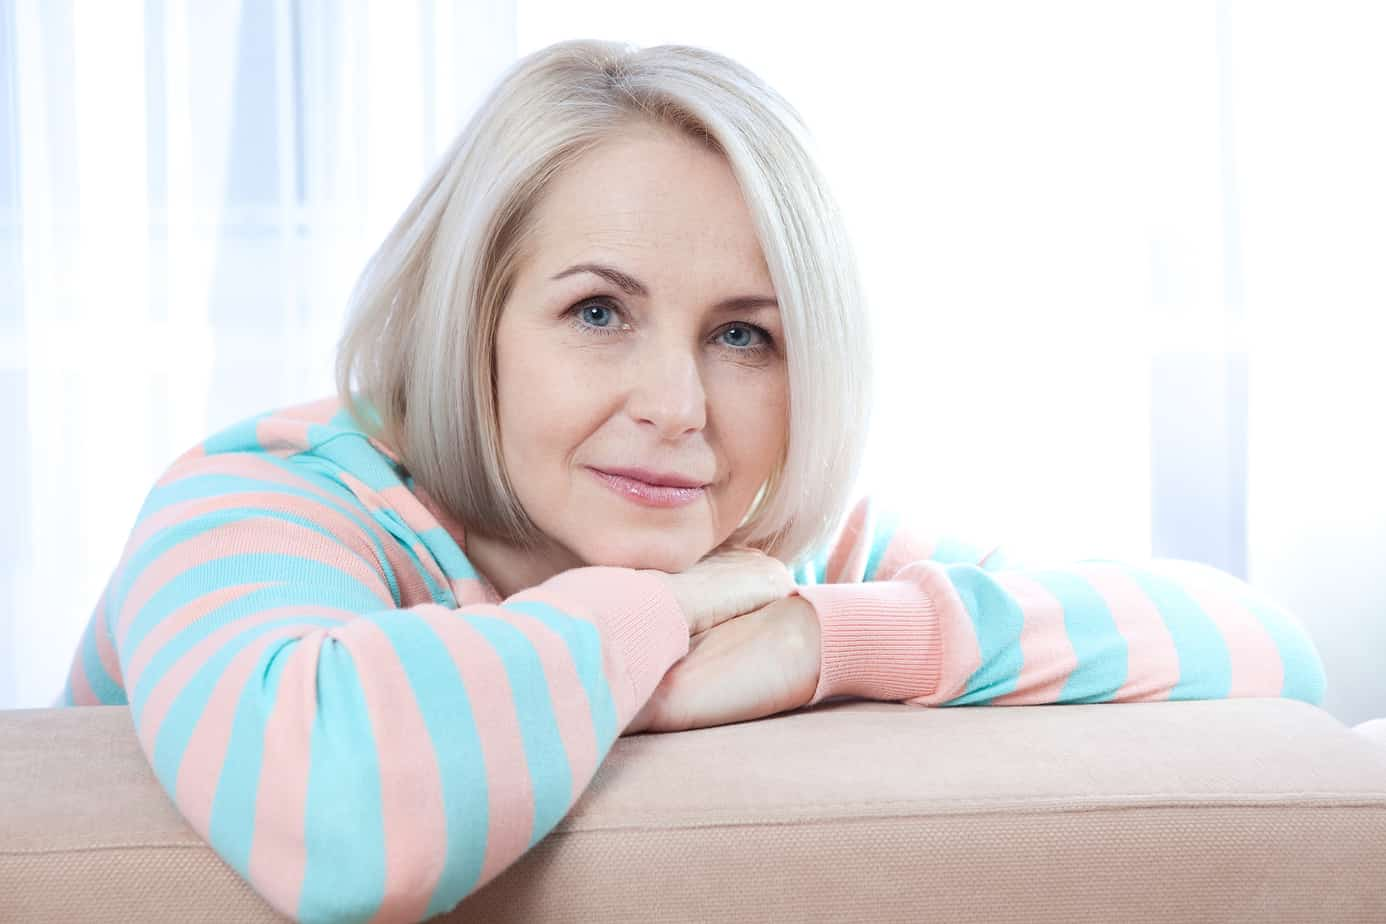 Menopausa donna mezza eta